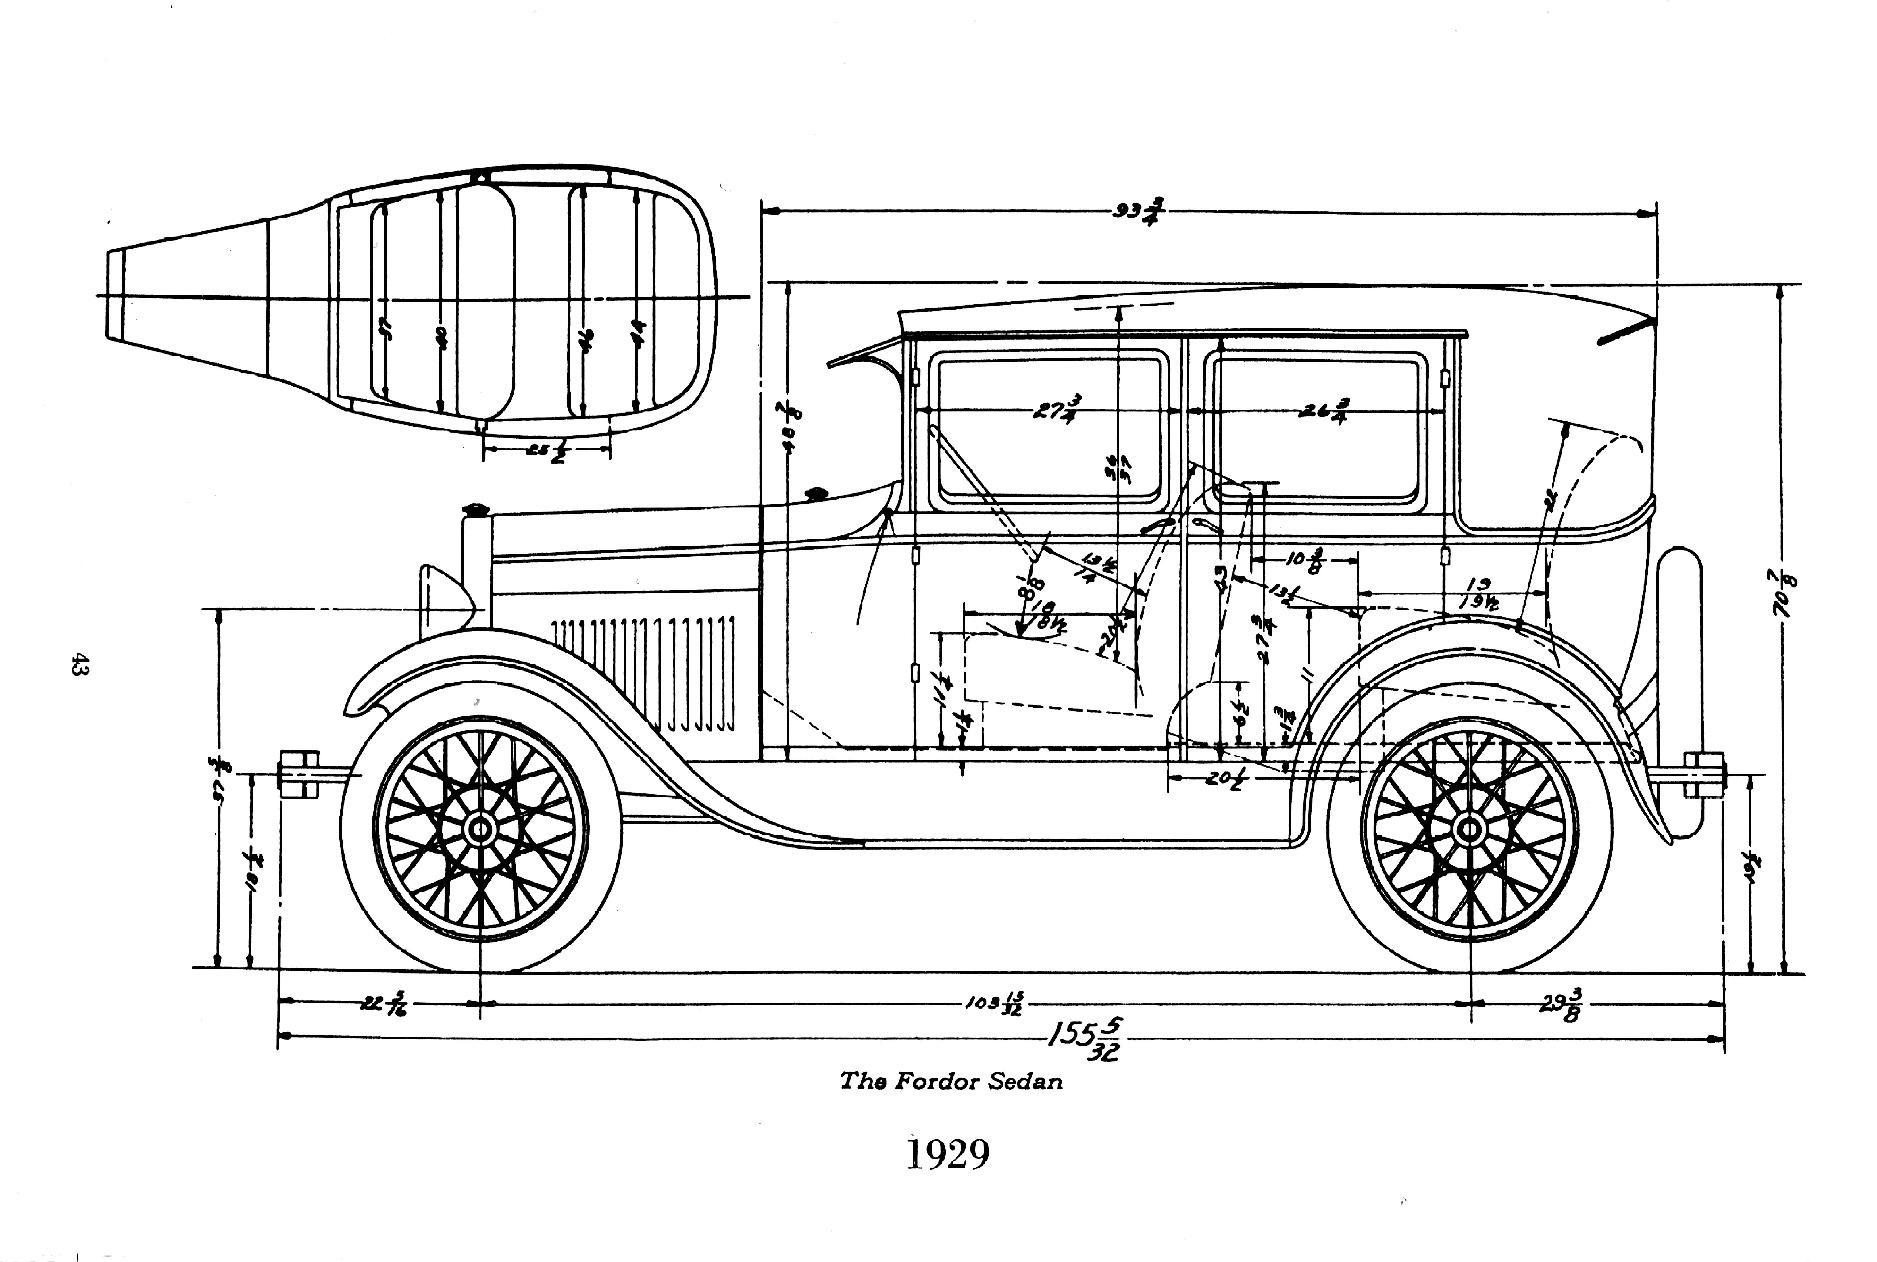 57 vw wiring harness installation 28 29 fordor sedan netclassics     antique toys  cars  28 29 fordor sedan netclassics     antique toys  cars